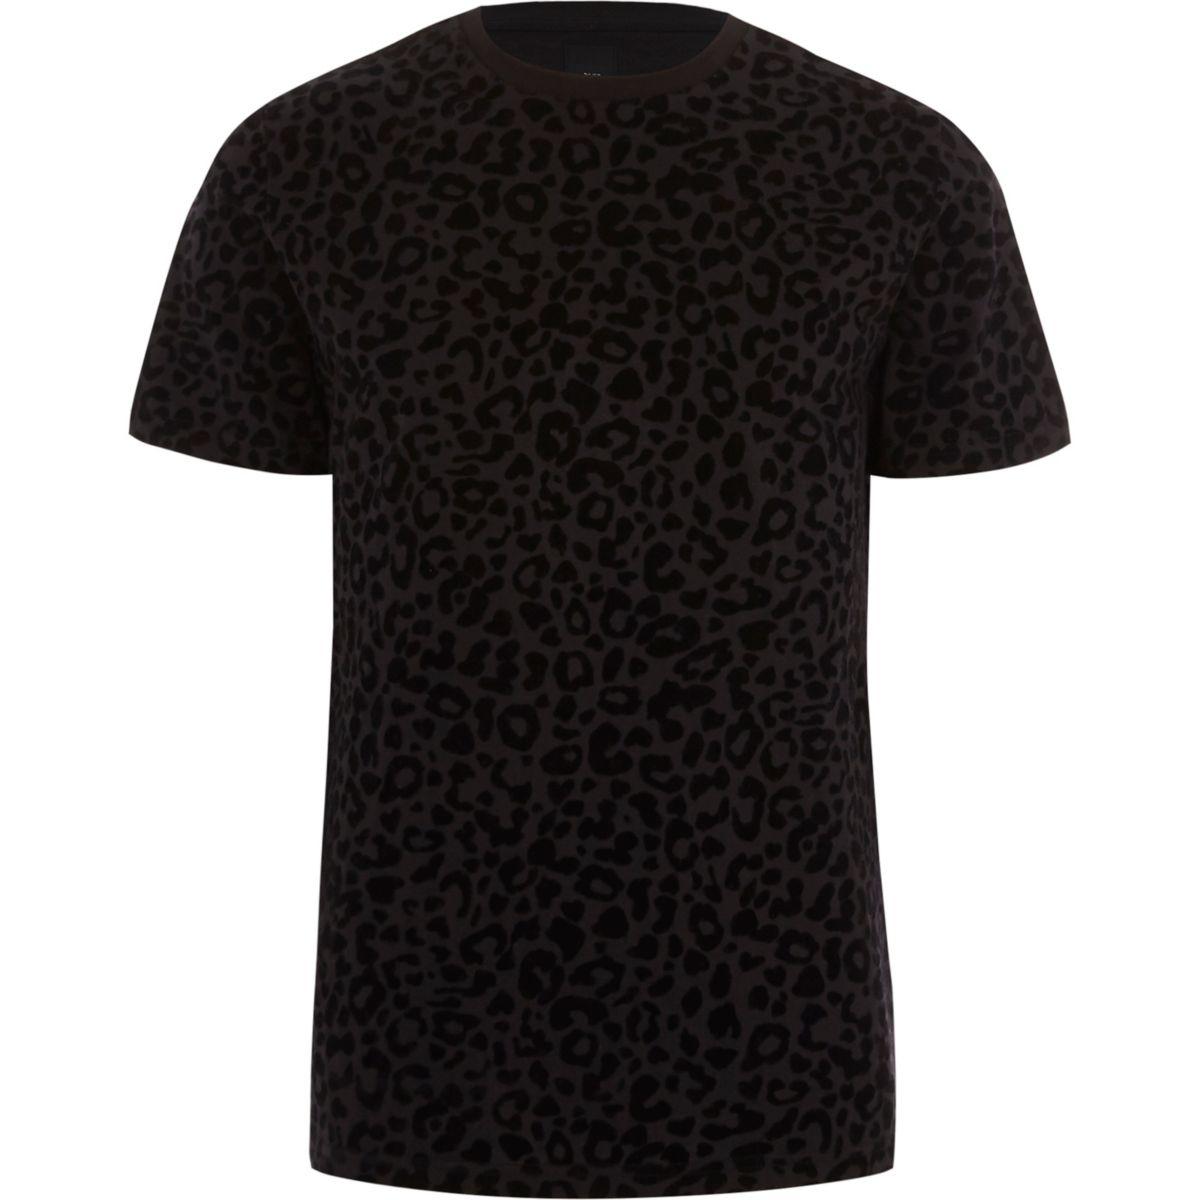 Zwarte slim-fit T-shirt met luipaardprint